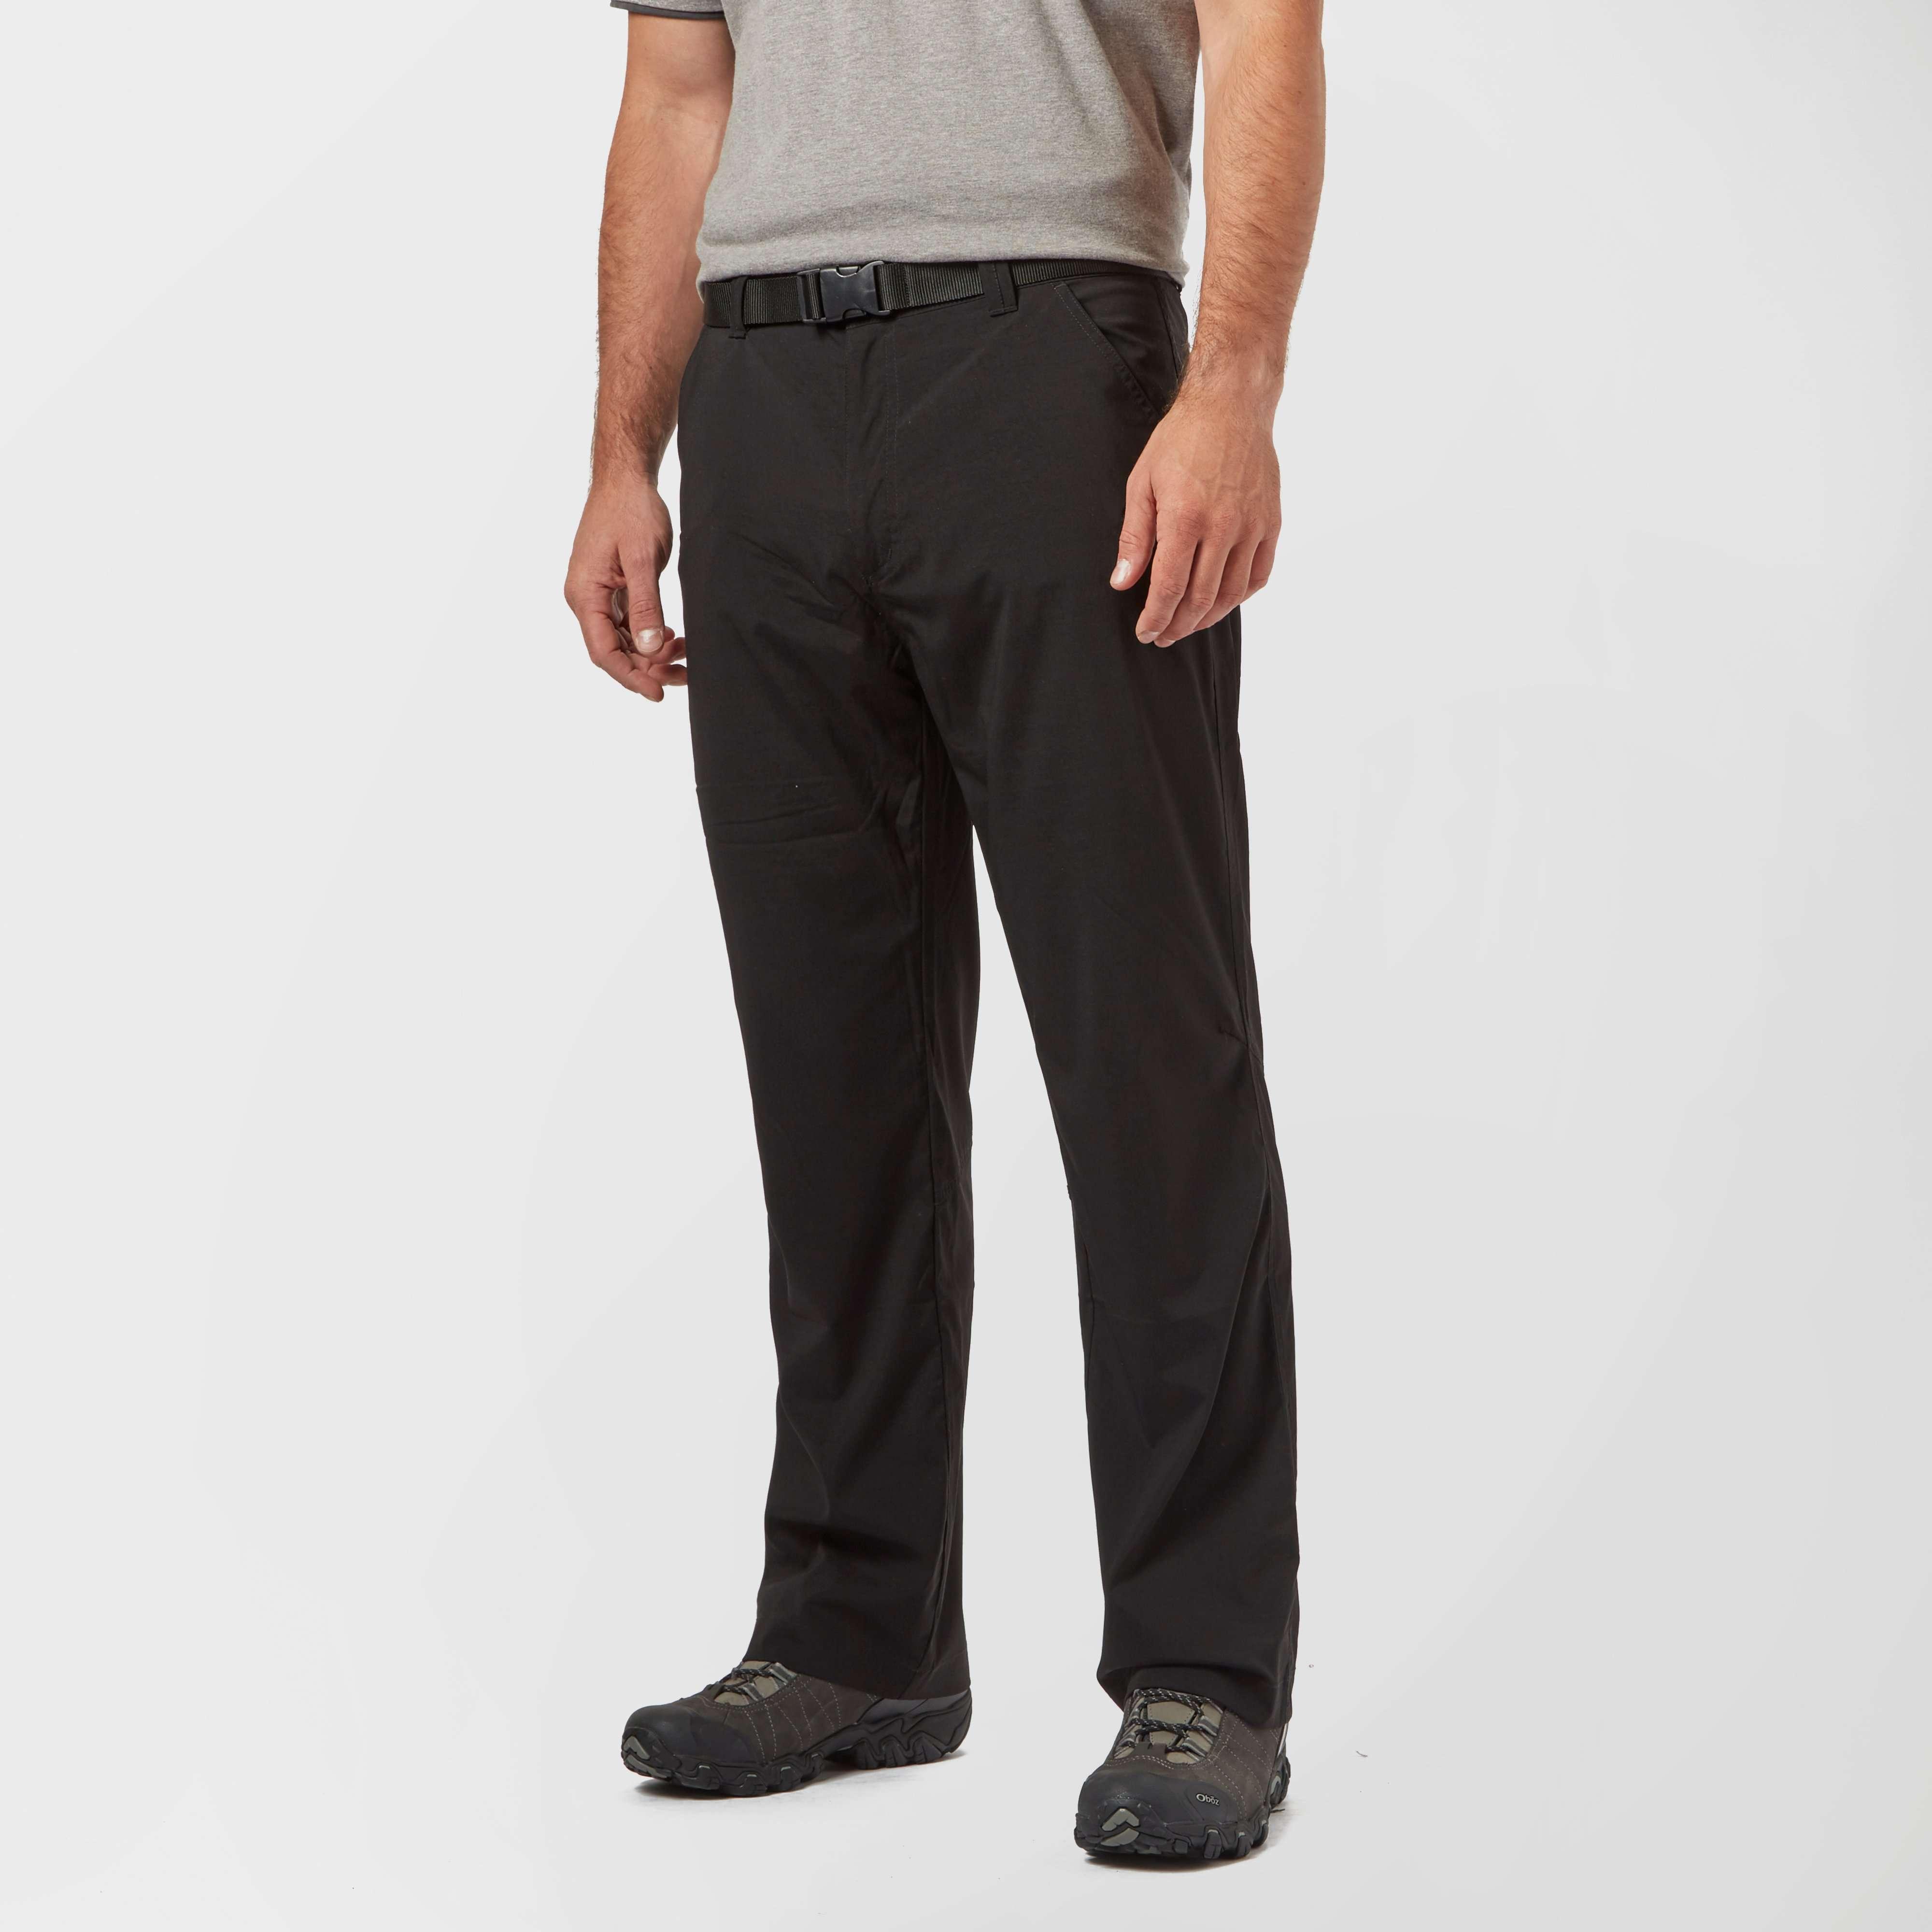 PETER STORM Men's Stretch Walking Trousers